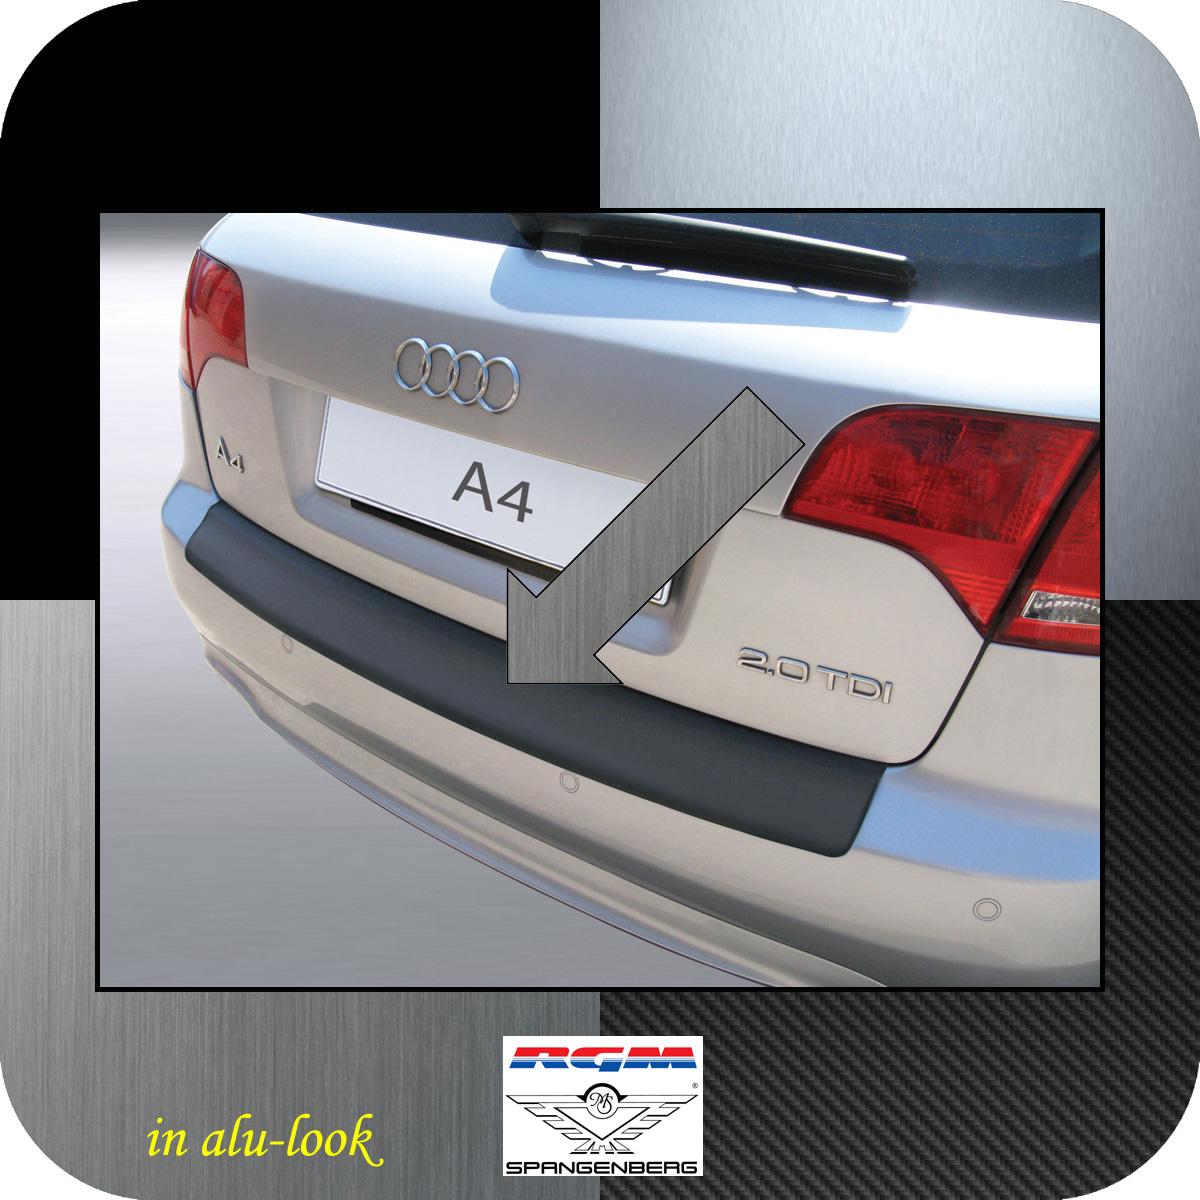 Ladekantenschutz Alu-Look Audi A4 B7 Avant Kombi auch S-Line 2004-08 3504462